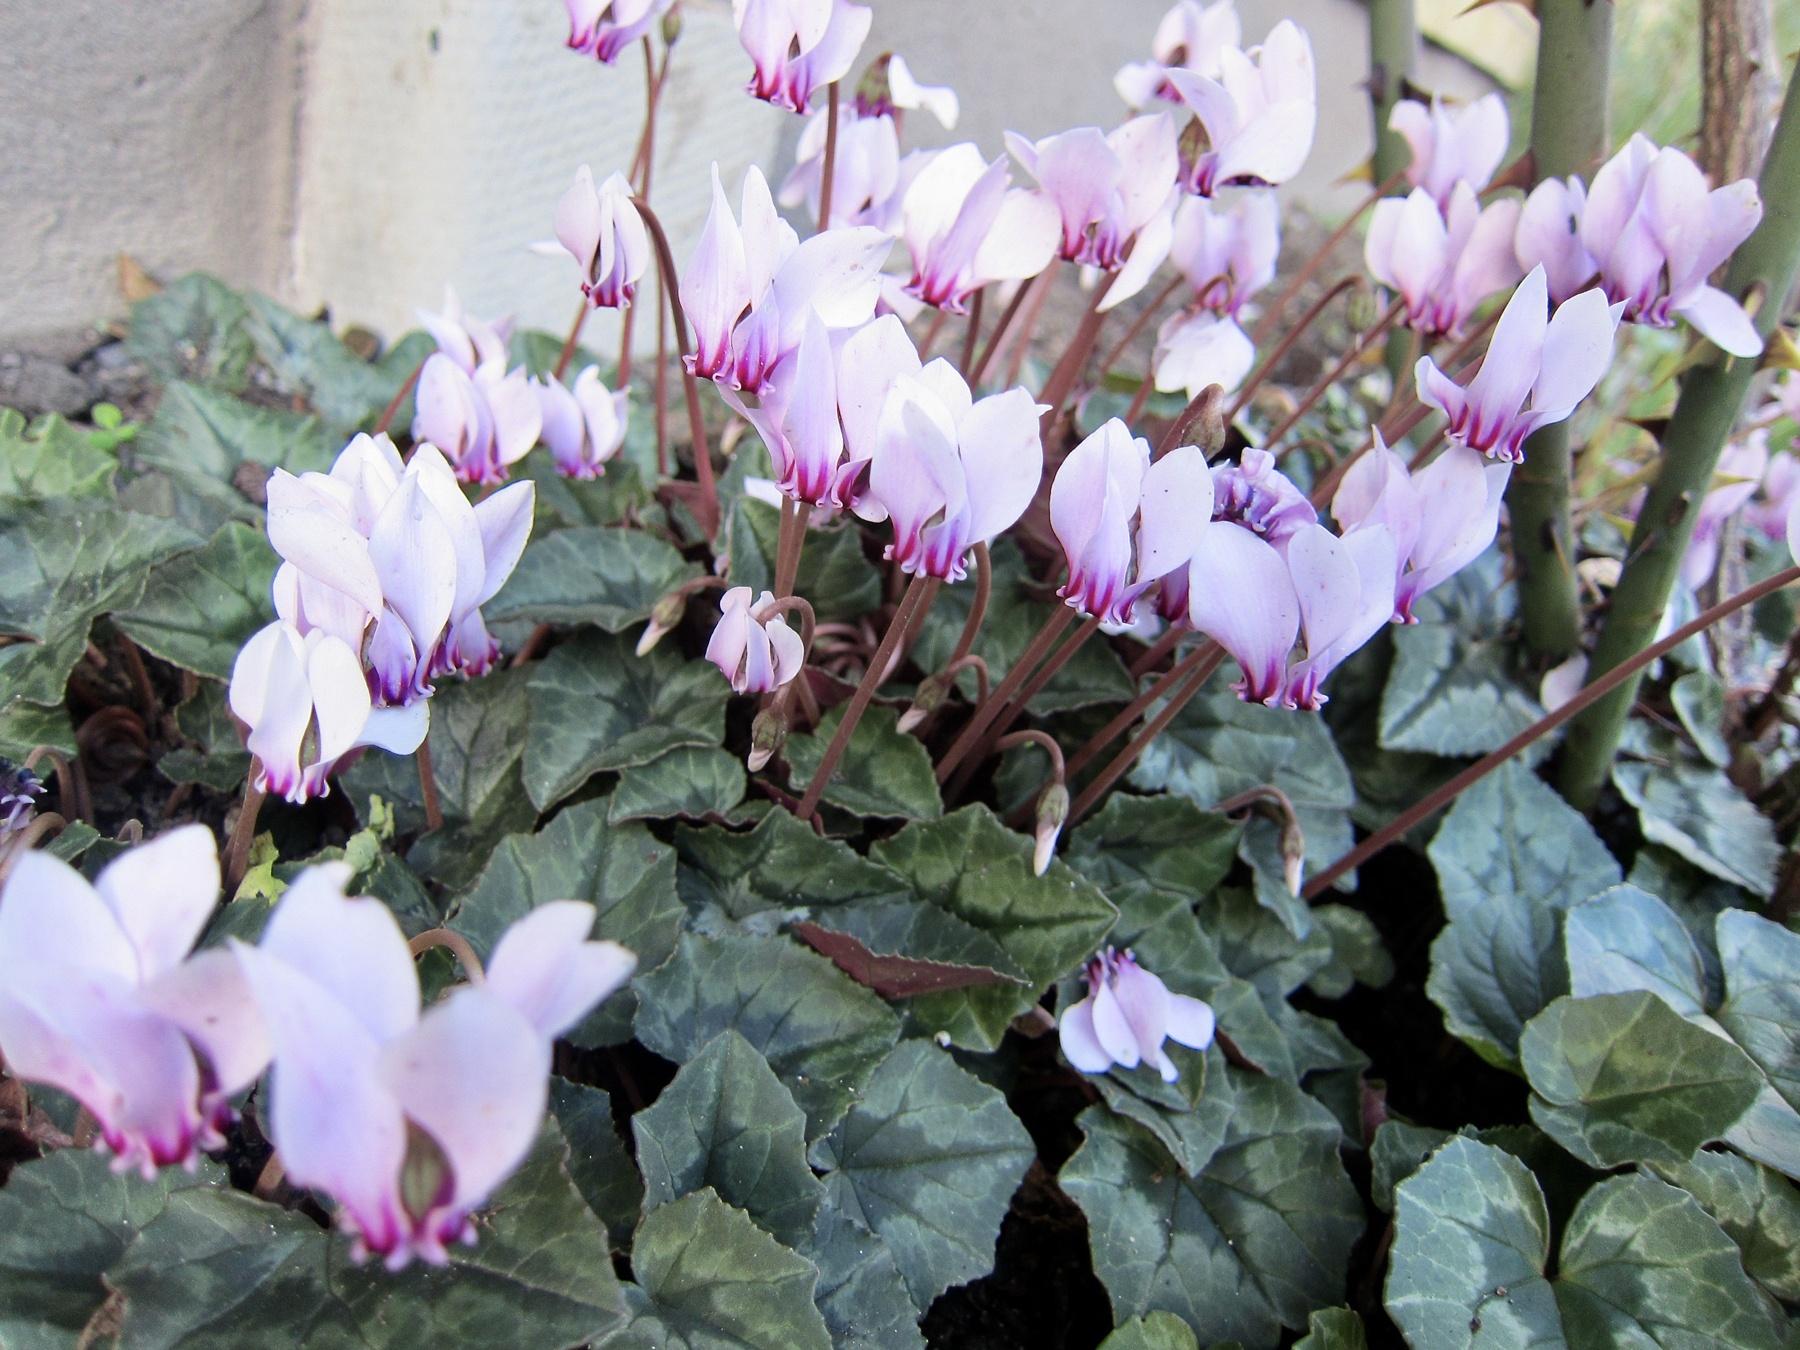 Höstcyklamen (Cyclamen hederifolium). Foto: Marie Widén.